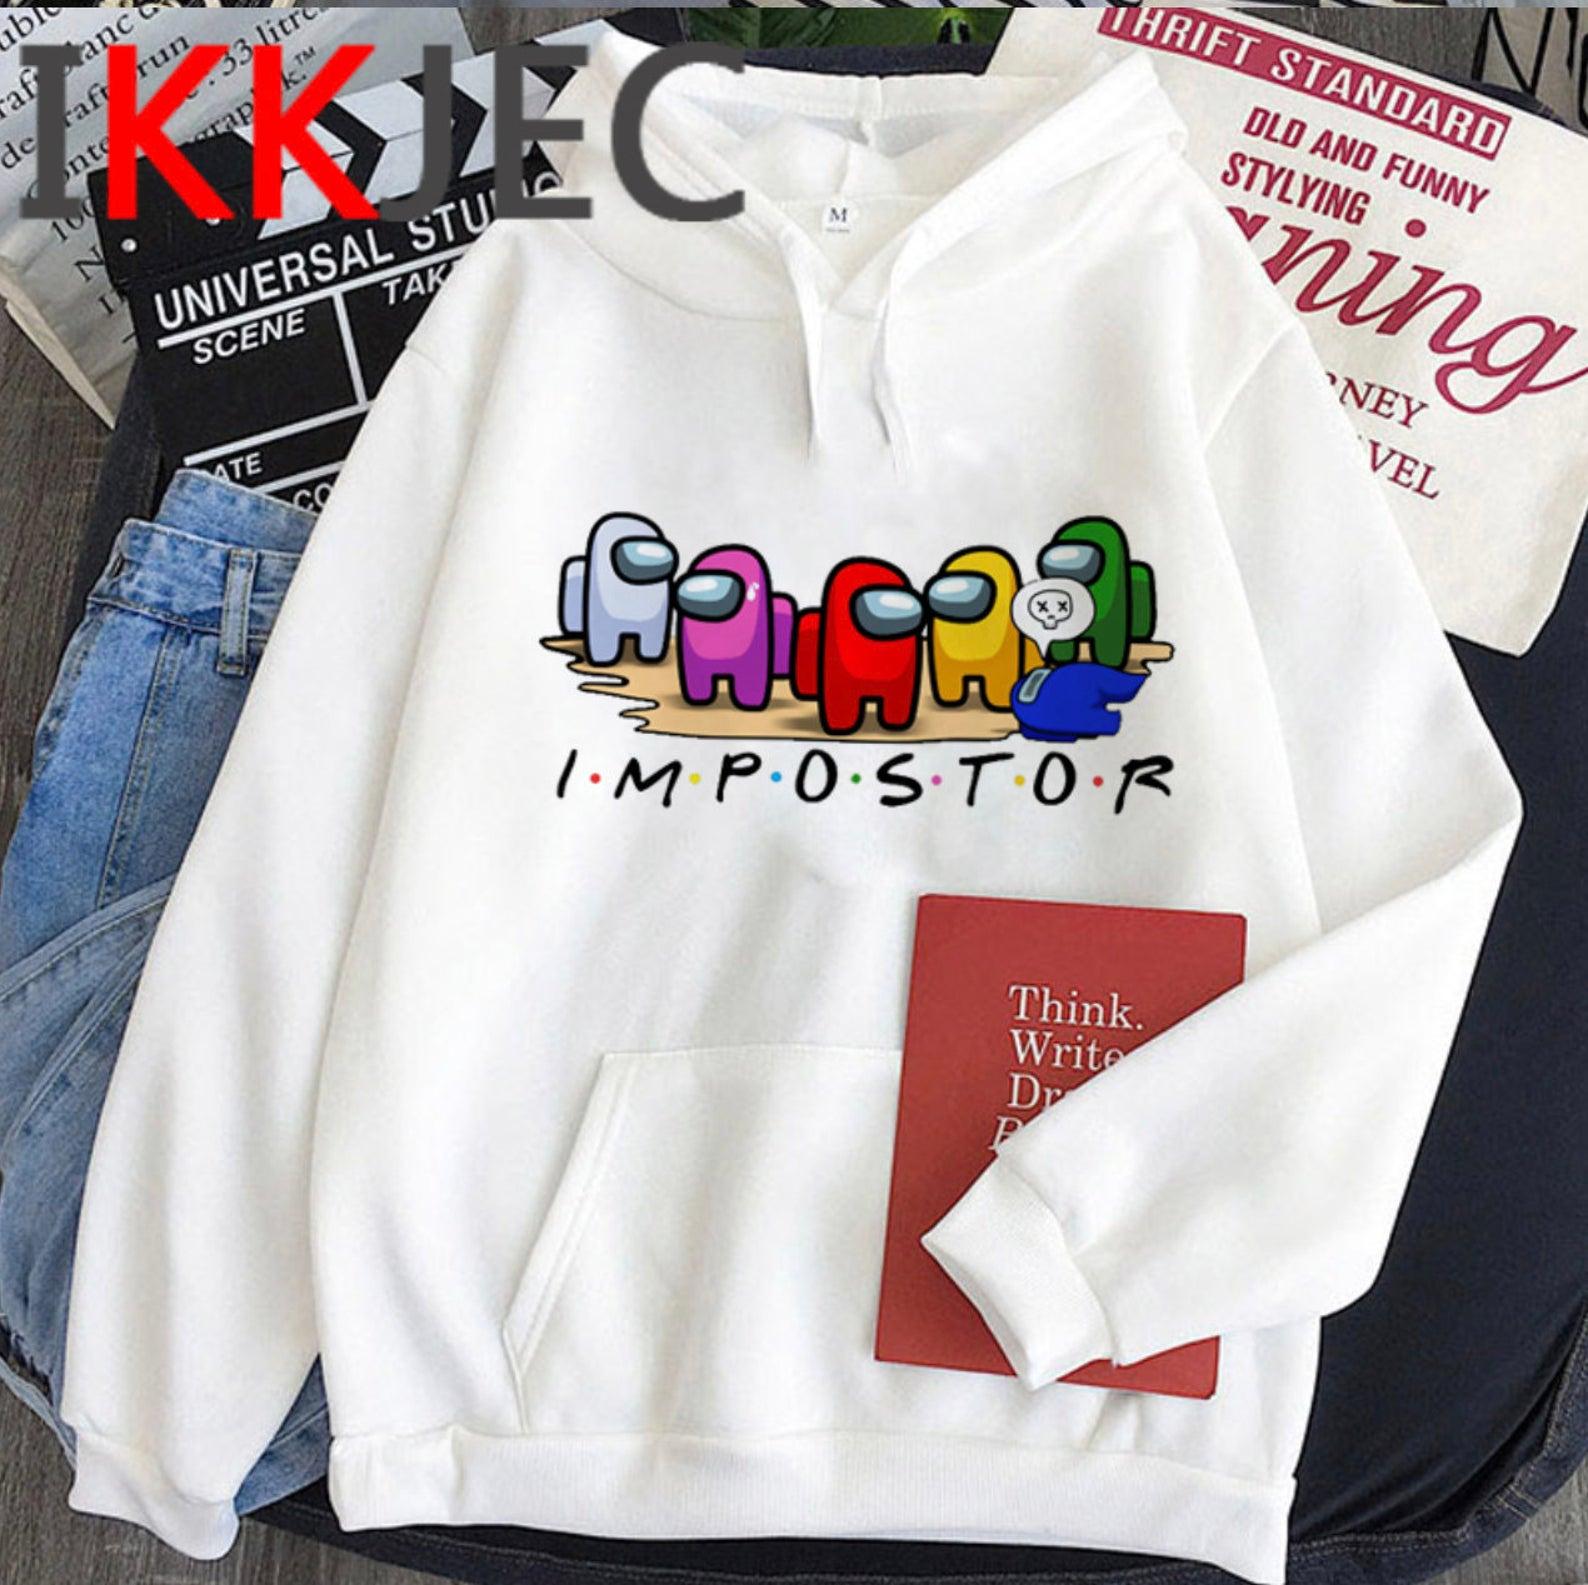 Among Us Friends Hoodie, Impostor Hoodie, Crewmate Hoodie, Among Us Sweatshirt, Among Us shirt, Among Us Sweater, Gamer Shirt,Gift For Gamer